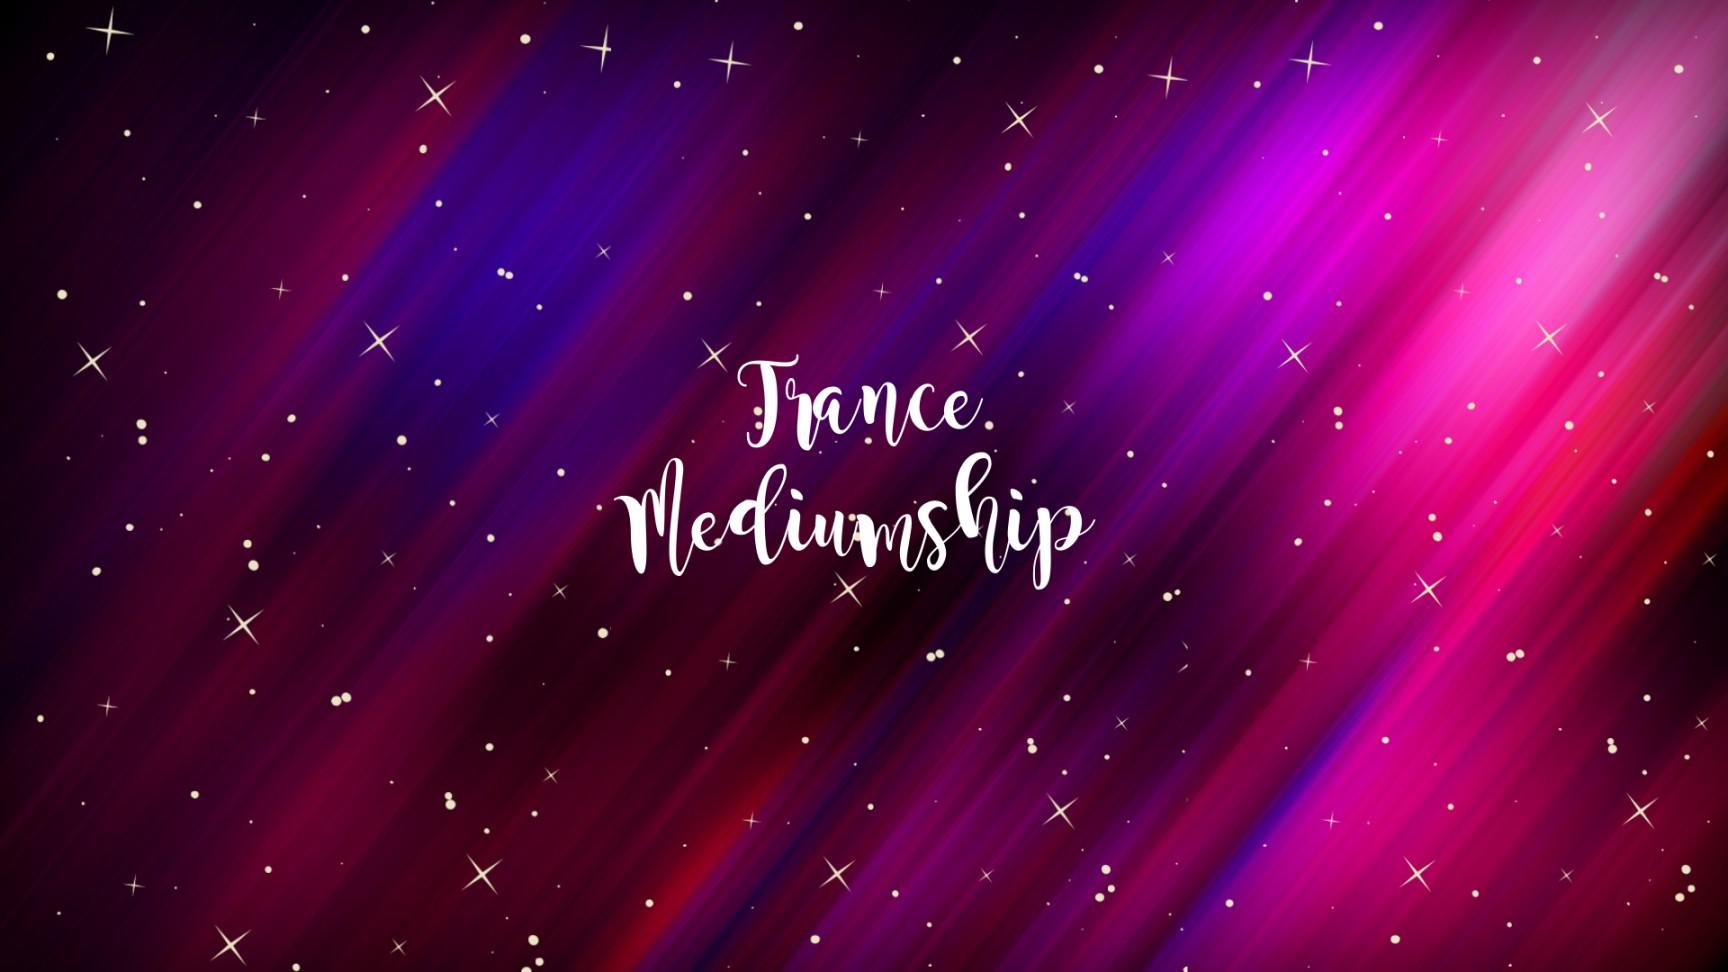 Trance Mediumship